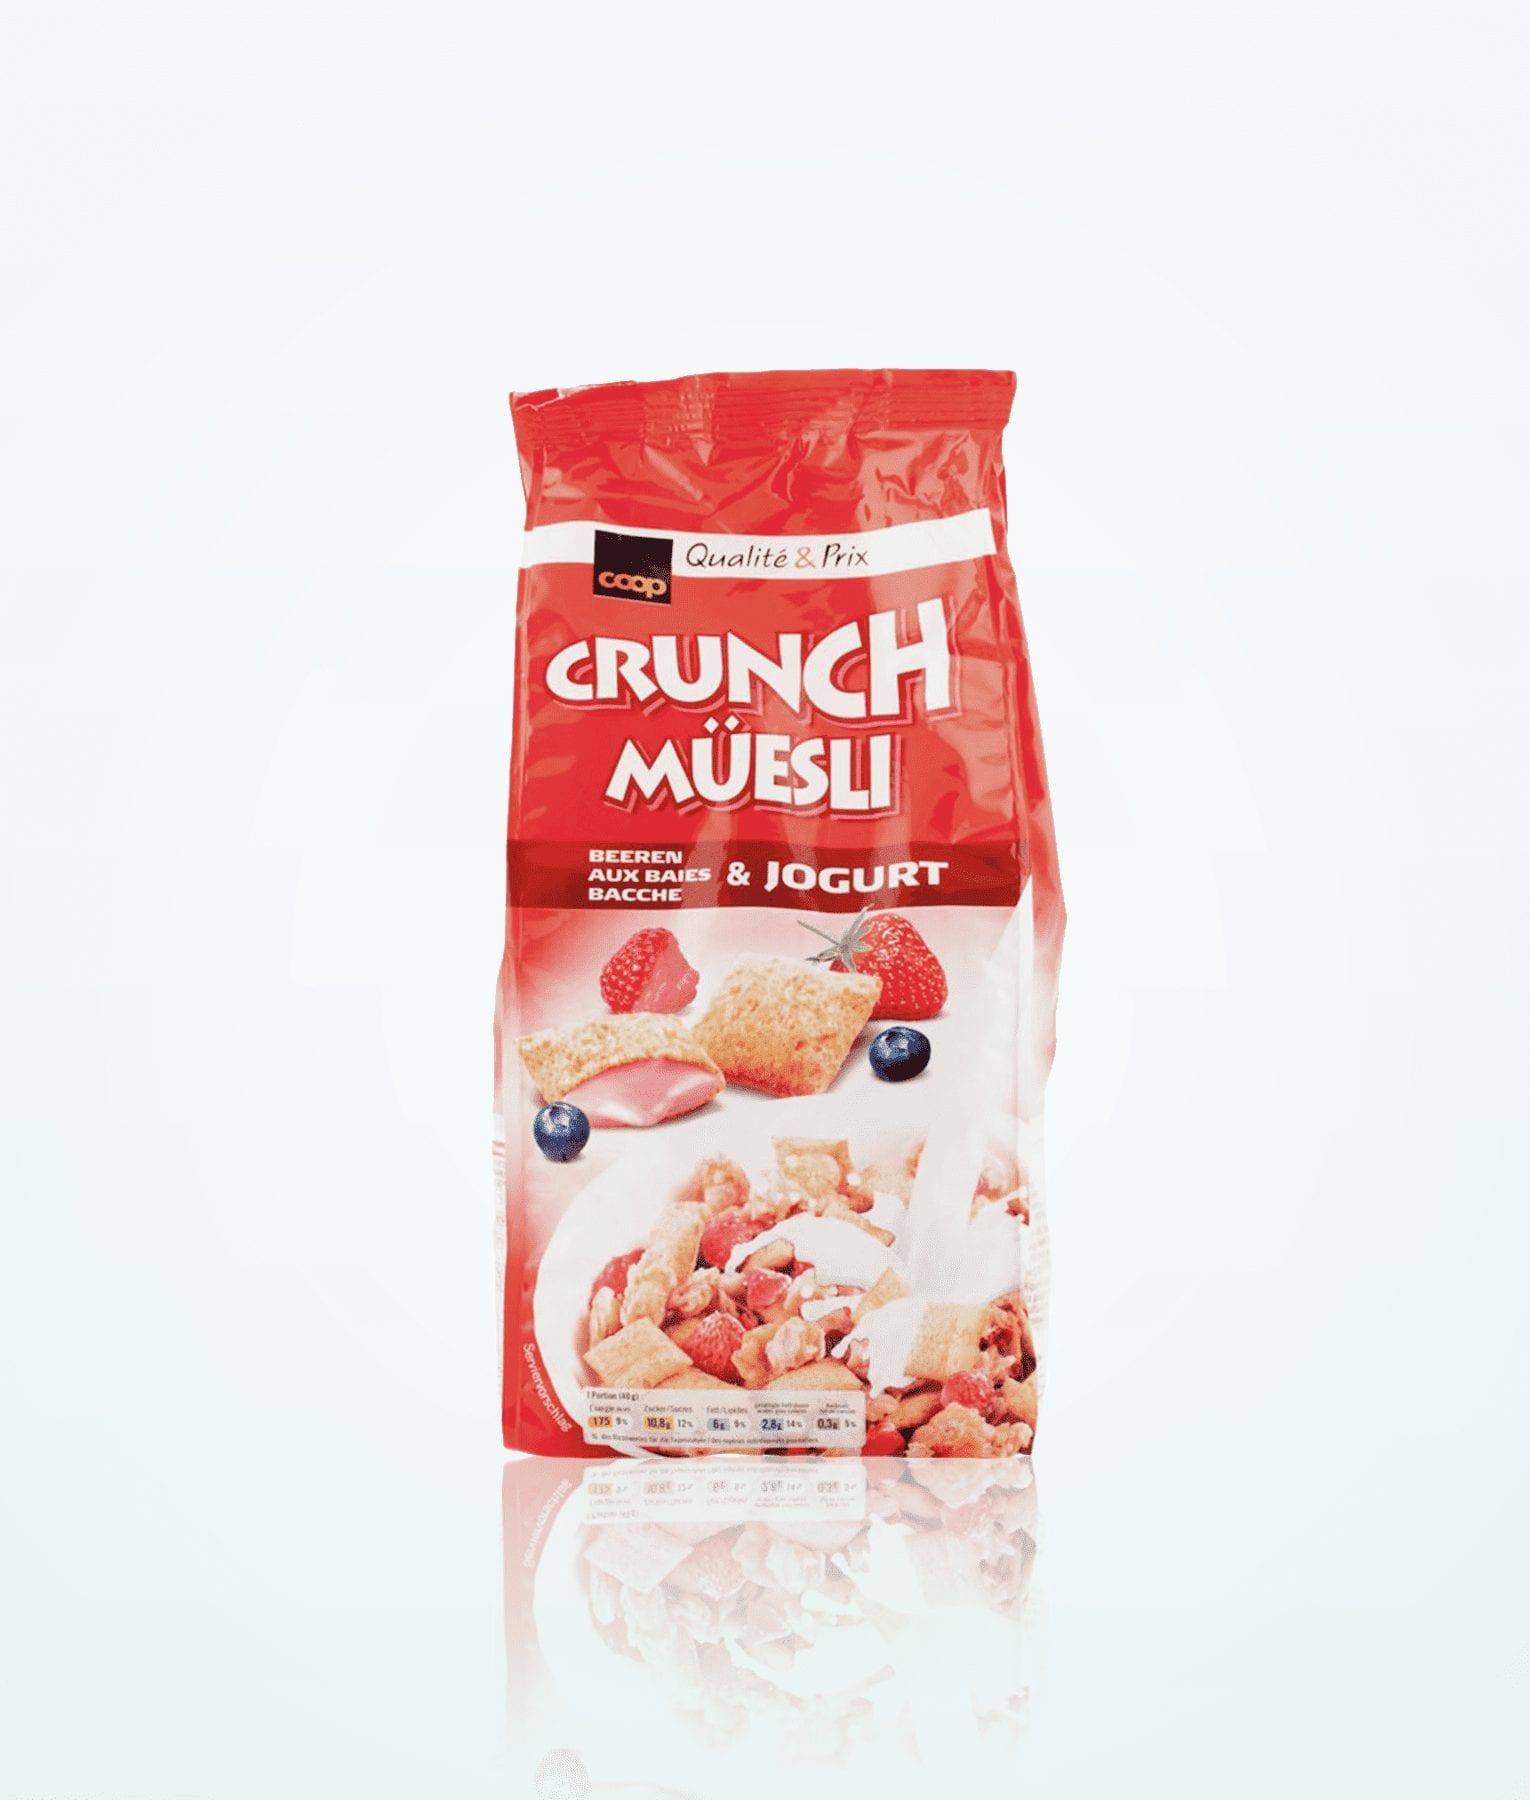 crunch-muesli-with-berries-and-joghurt